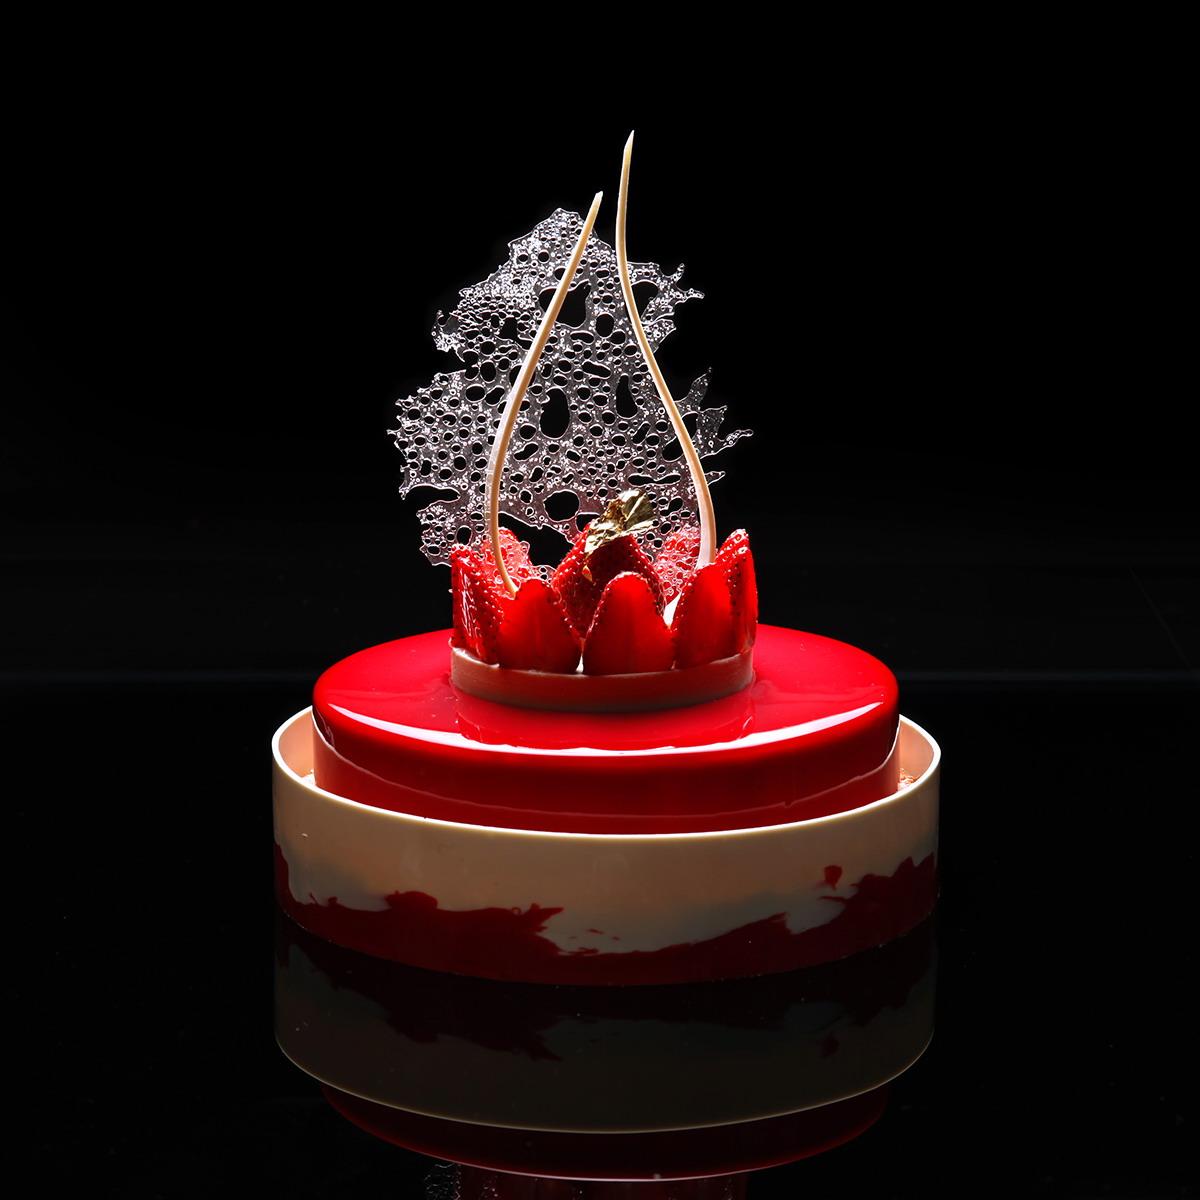 dinara kasko geometrical and mathematical cake design